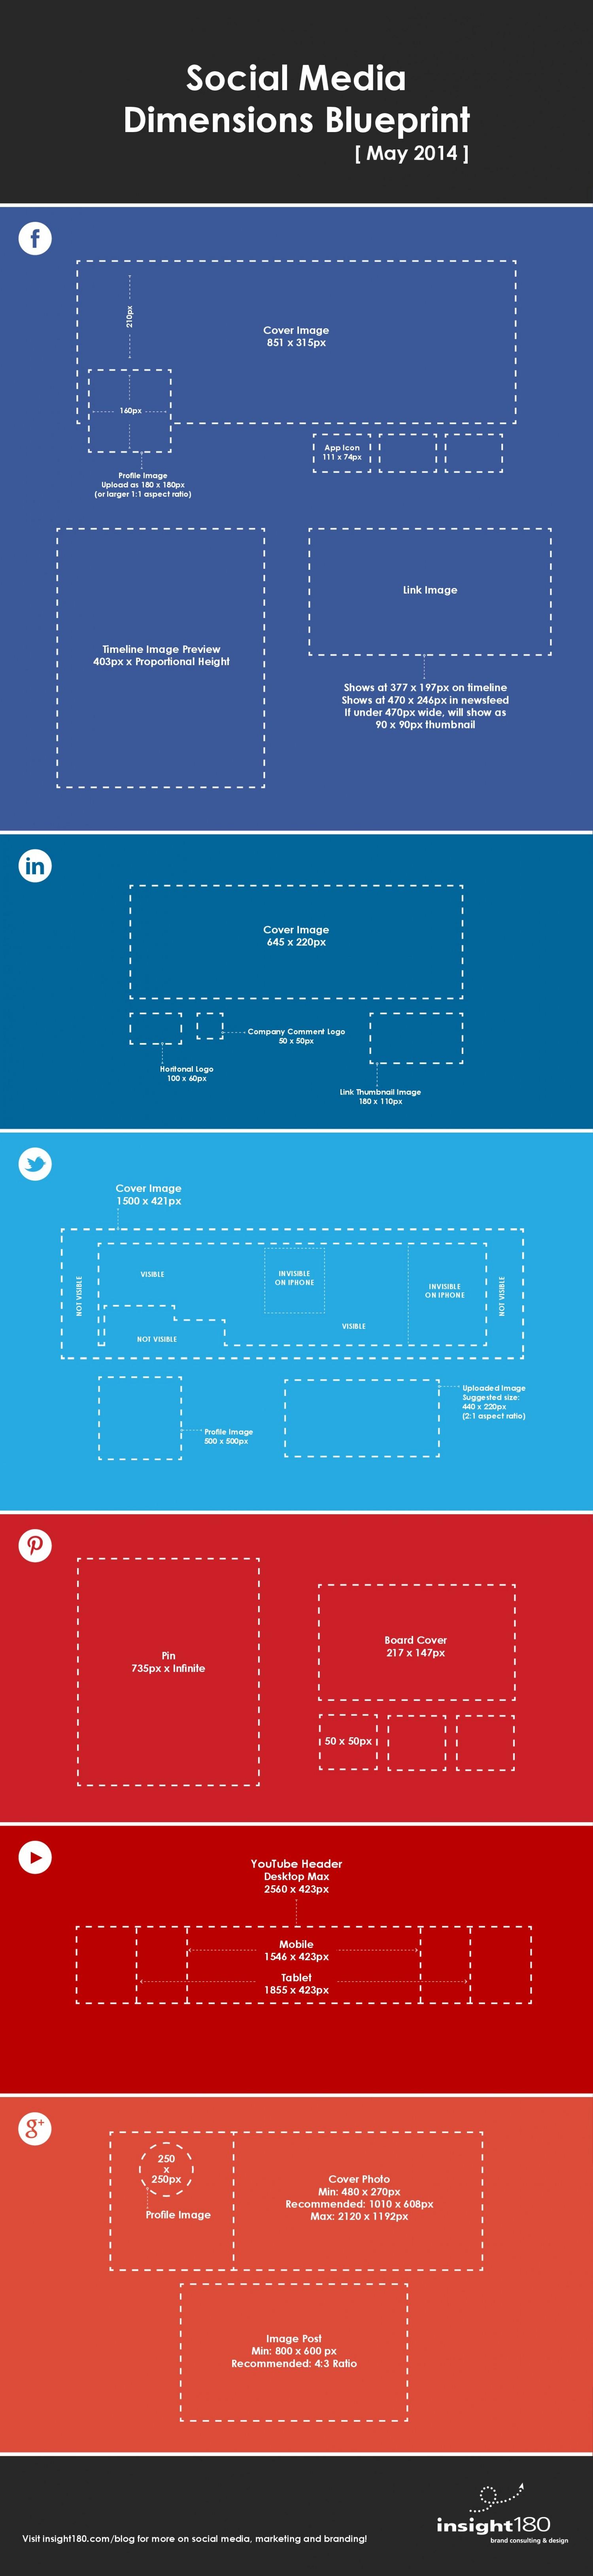 The social media dimensions blueprint for Blueprint sizes